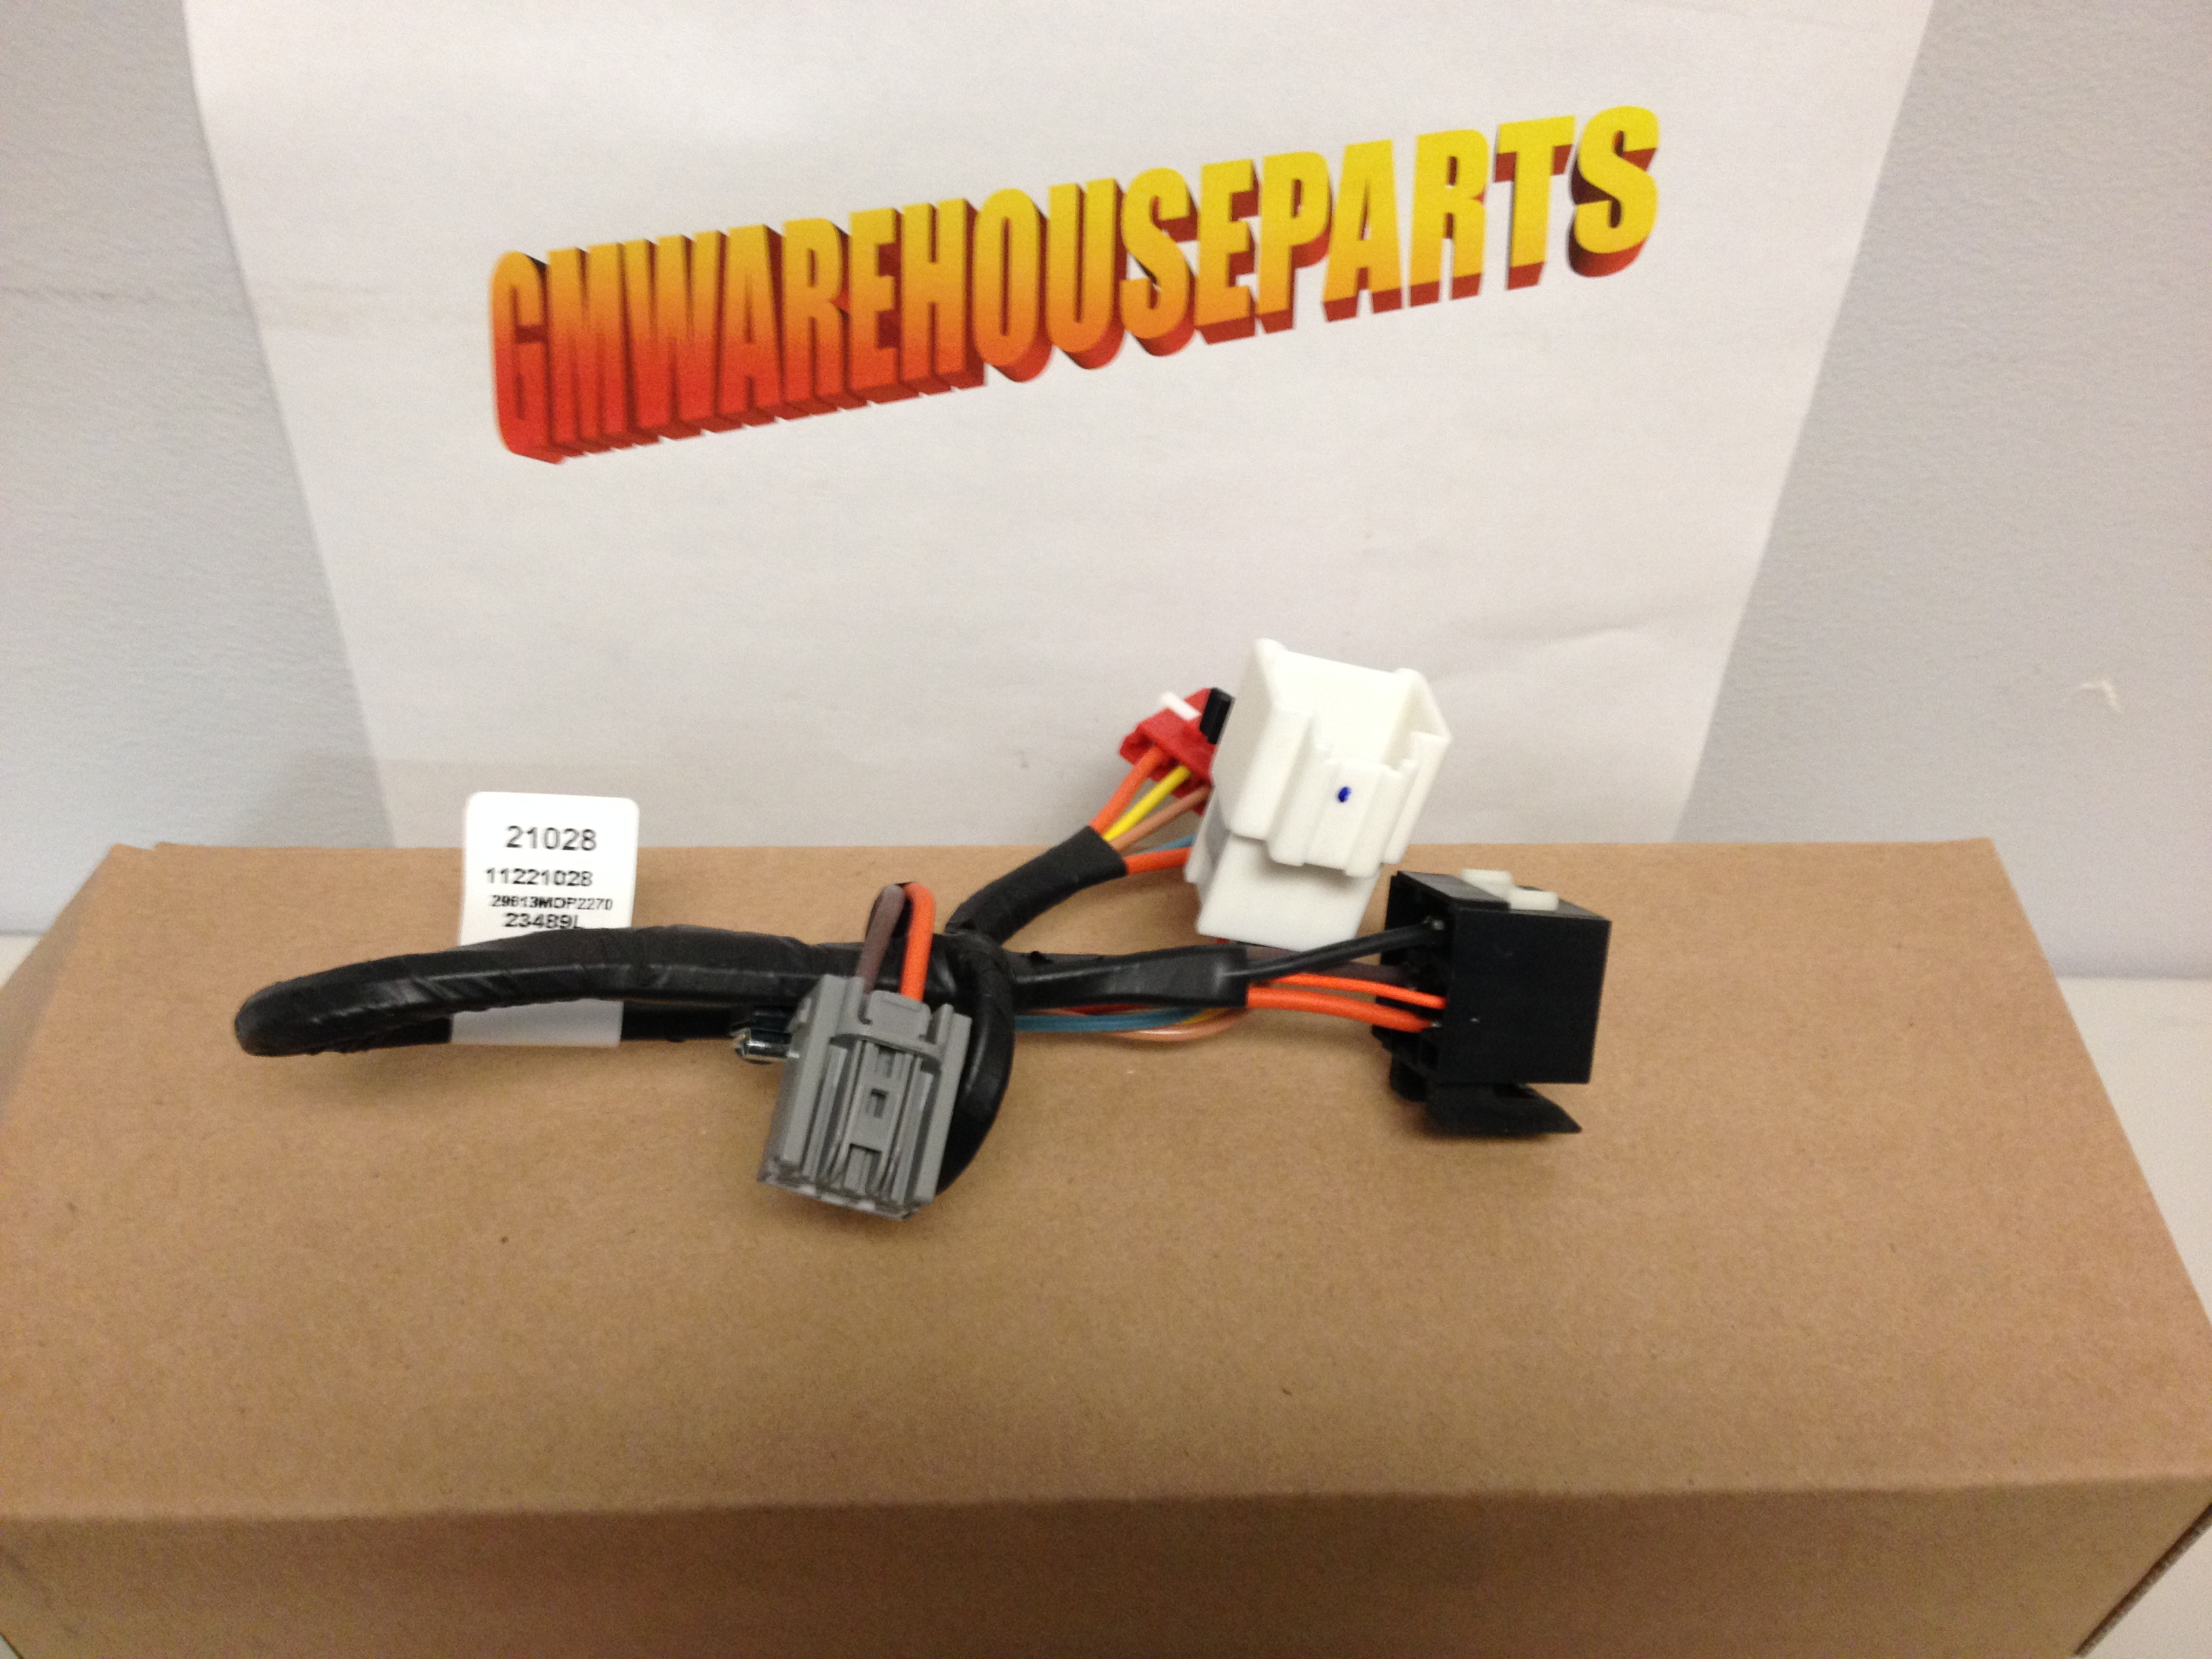 3502510_53ece632ede54 h3 blower motor wiring harness cbt1c110 blower motor wiring harness at gsmportal.co